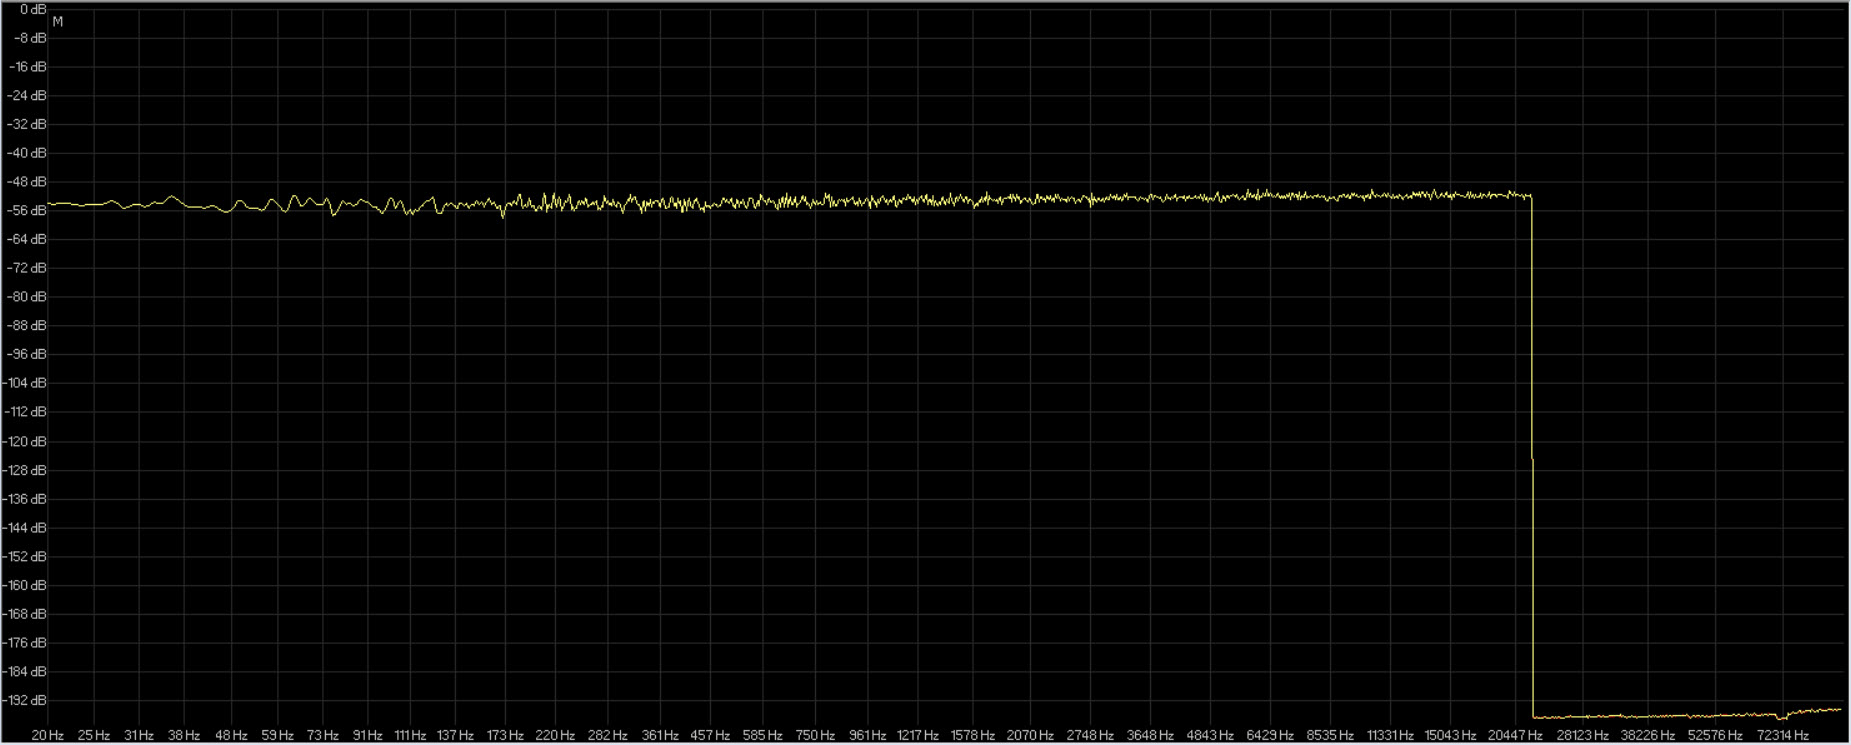 rumore bianco 16-44.1 dbpoweramp ( giallo ) rx5 ( rosso ).jpg